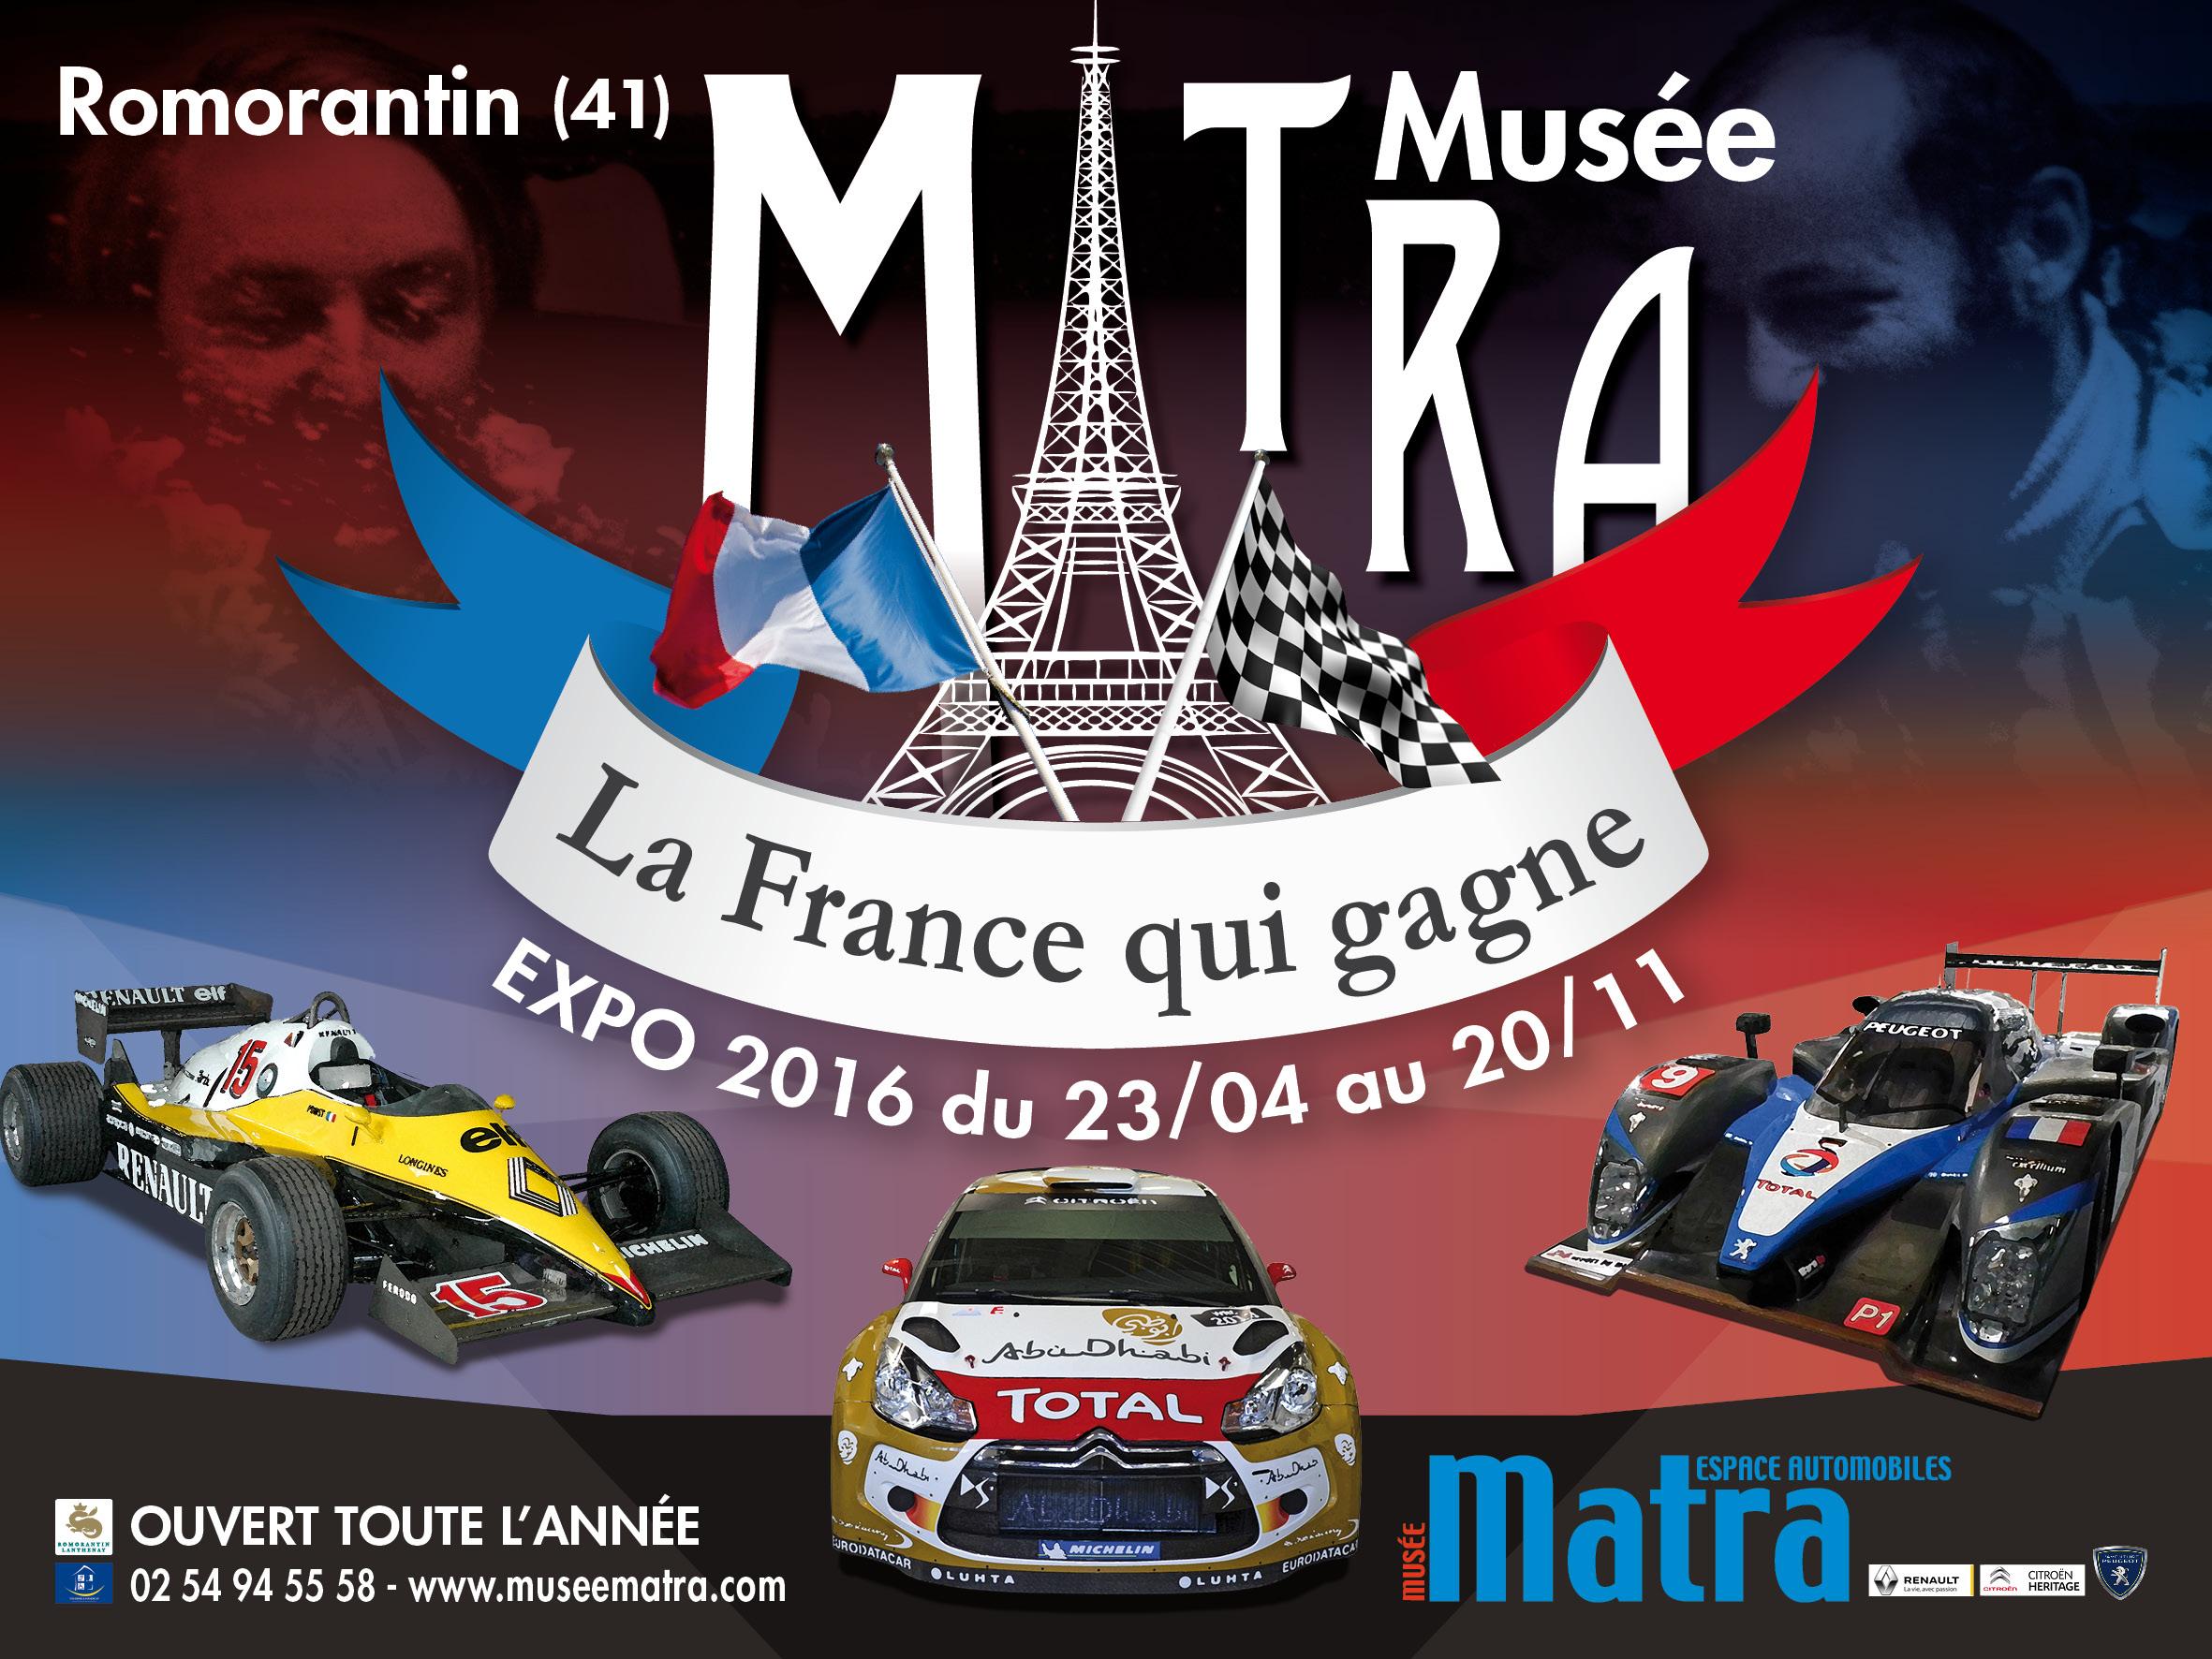 "Exposition : ""La France qui gagne"" @ Musée Matra | Romorantin-Lanthenay | Centre | France"